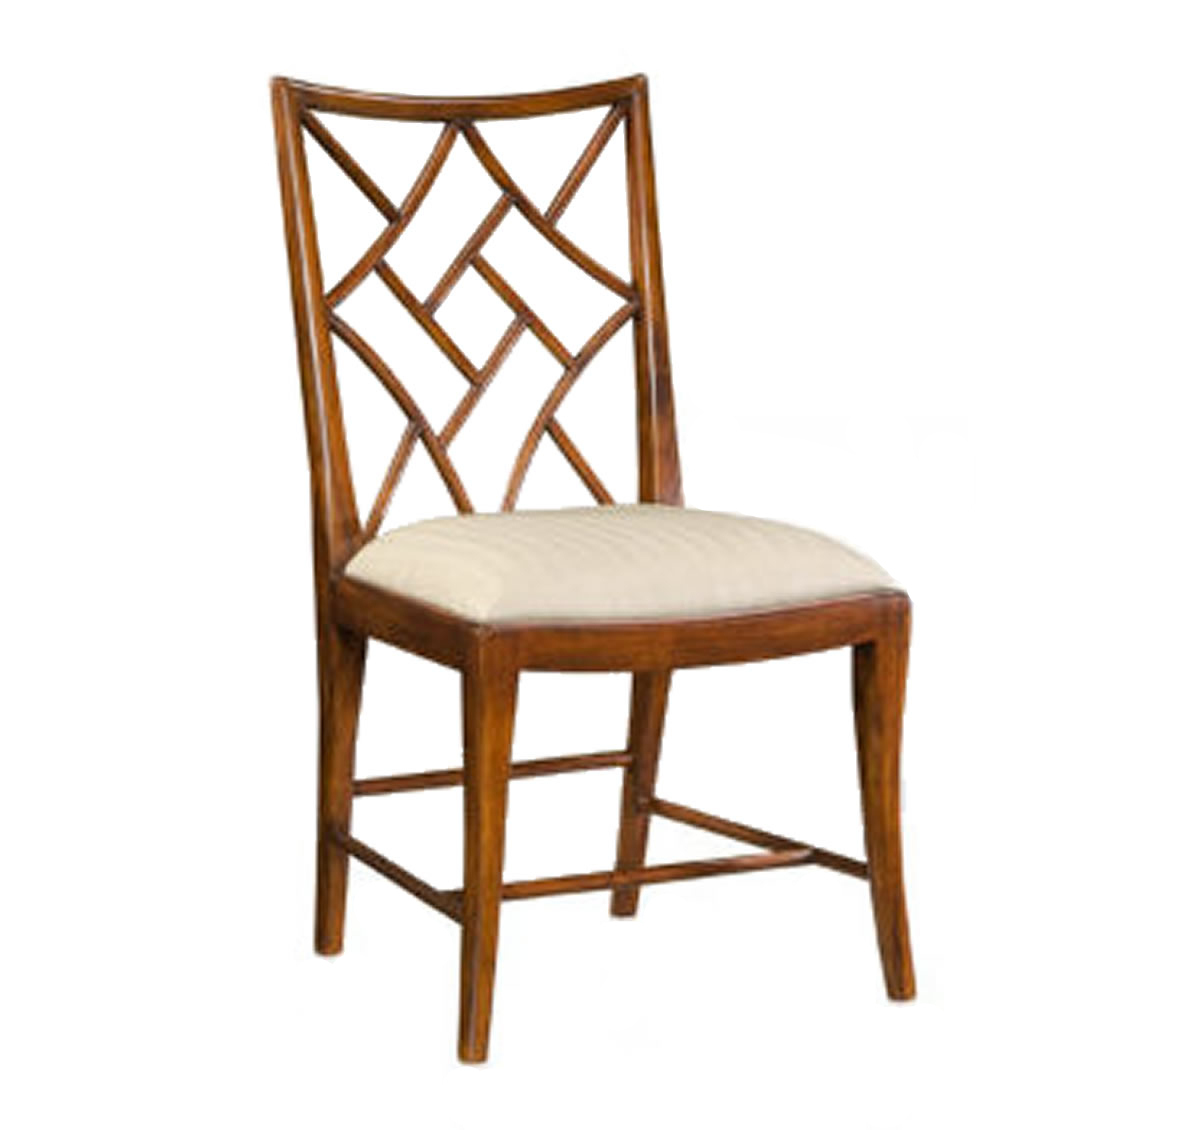 fretwork furniture. Fretwork Side Chair Furniture A